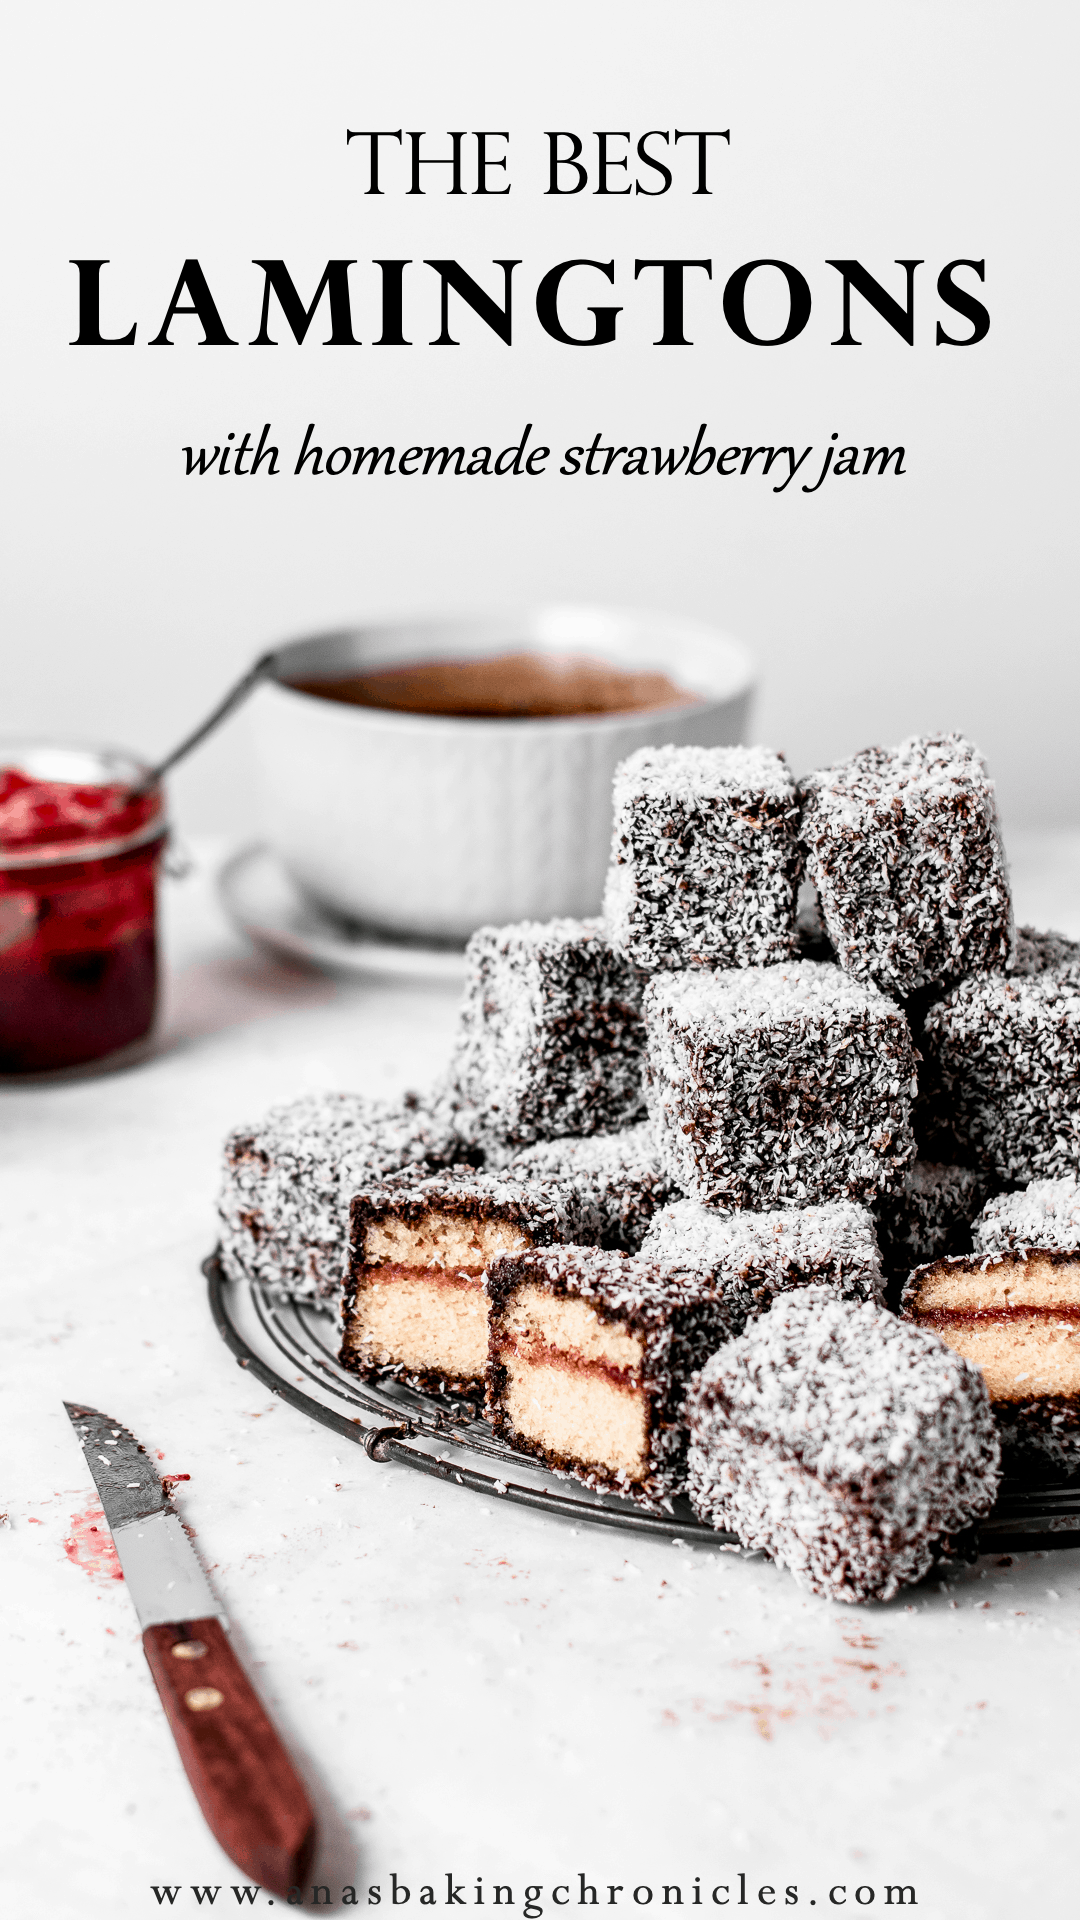 Lamingtons with homemade Strawberry jam